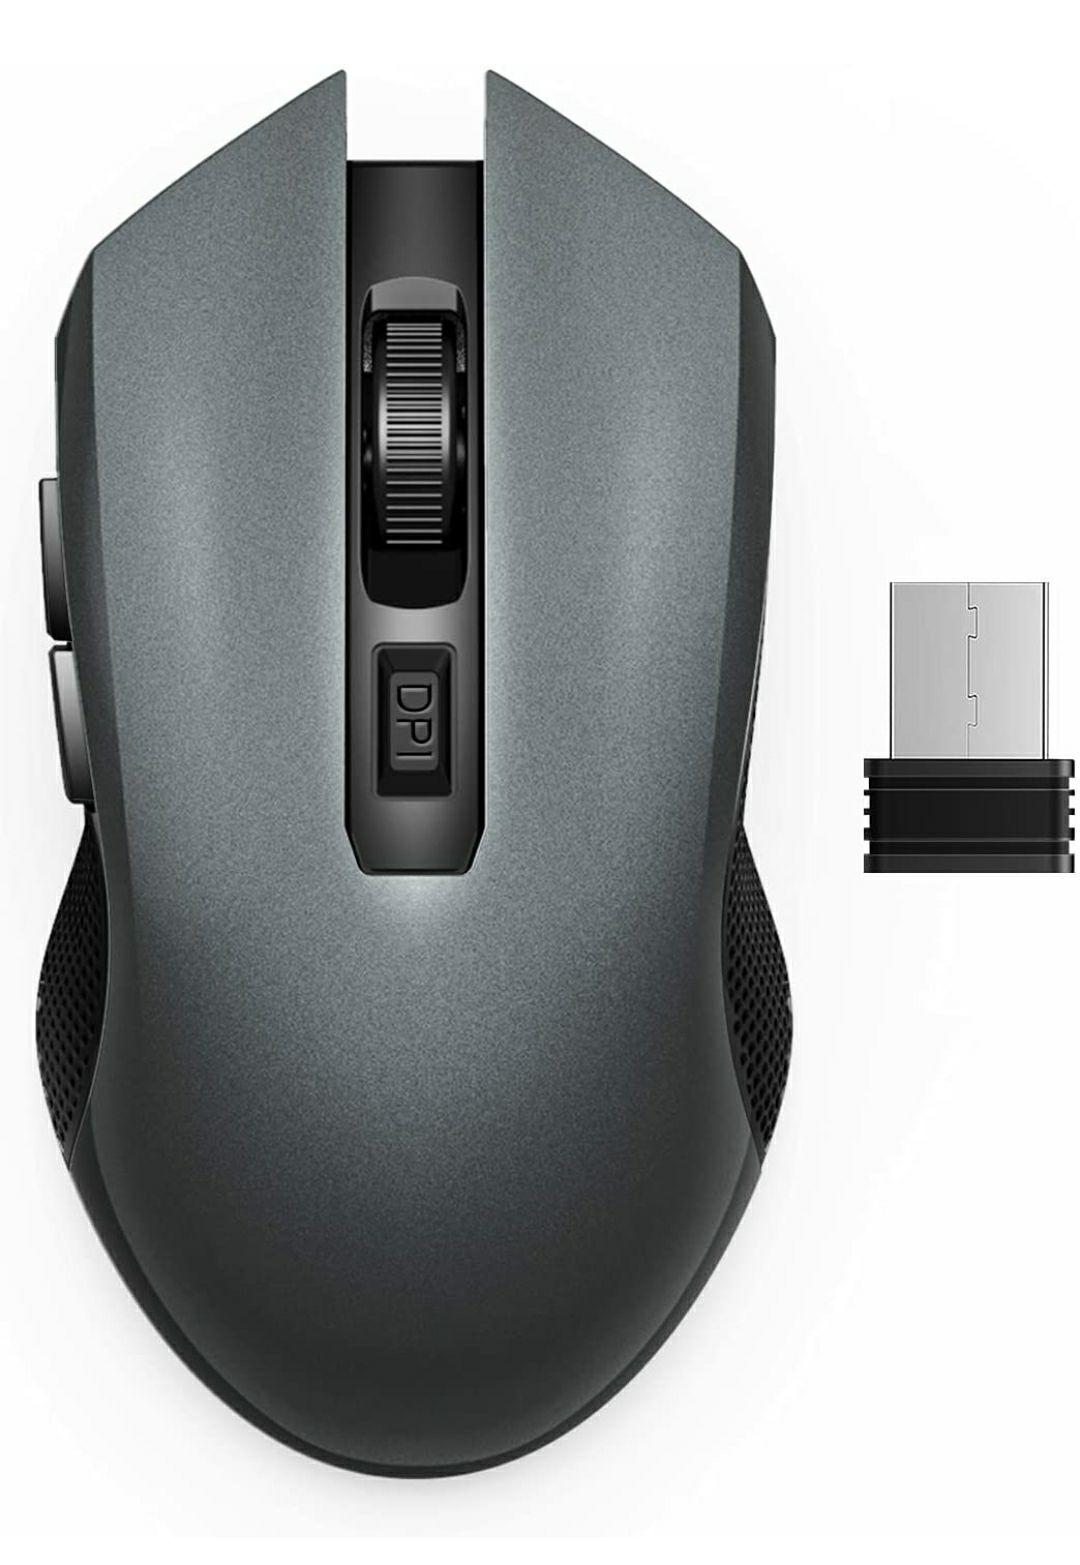 Mouse Wireless USB Silenzioso 1600DPI